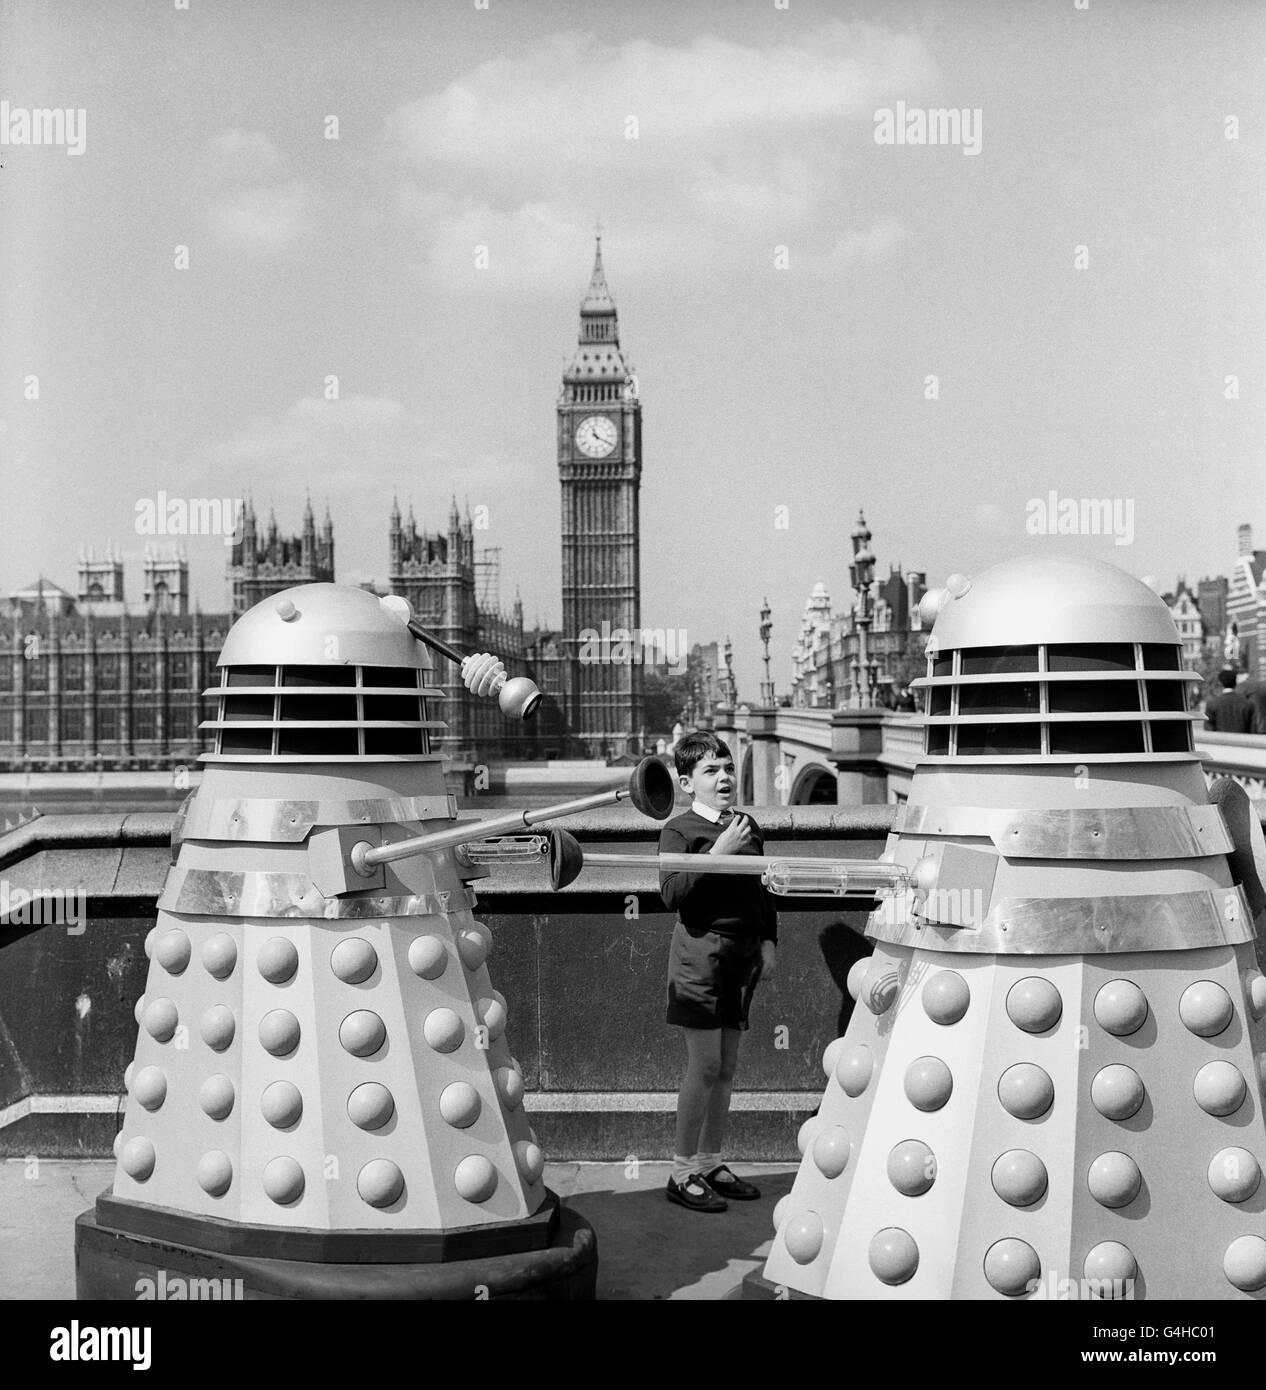 Andrew Meets The Daleks on Westminster Bridge - Stock Image